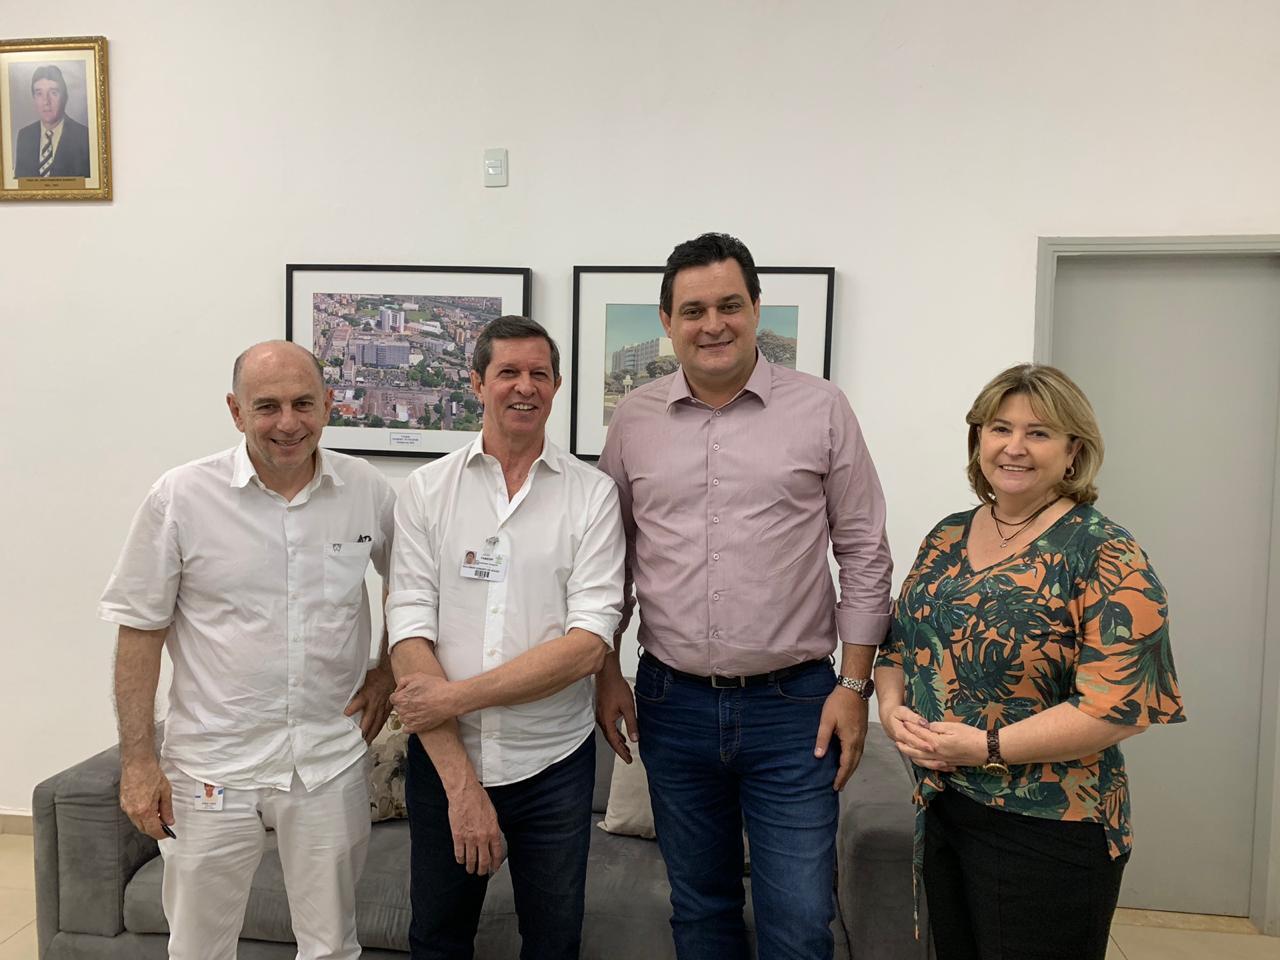 Geninho Zuliani anuncia emenda de R$ 500 mil para Hospital de Base de Rio Preto